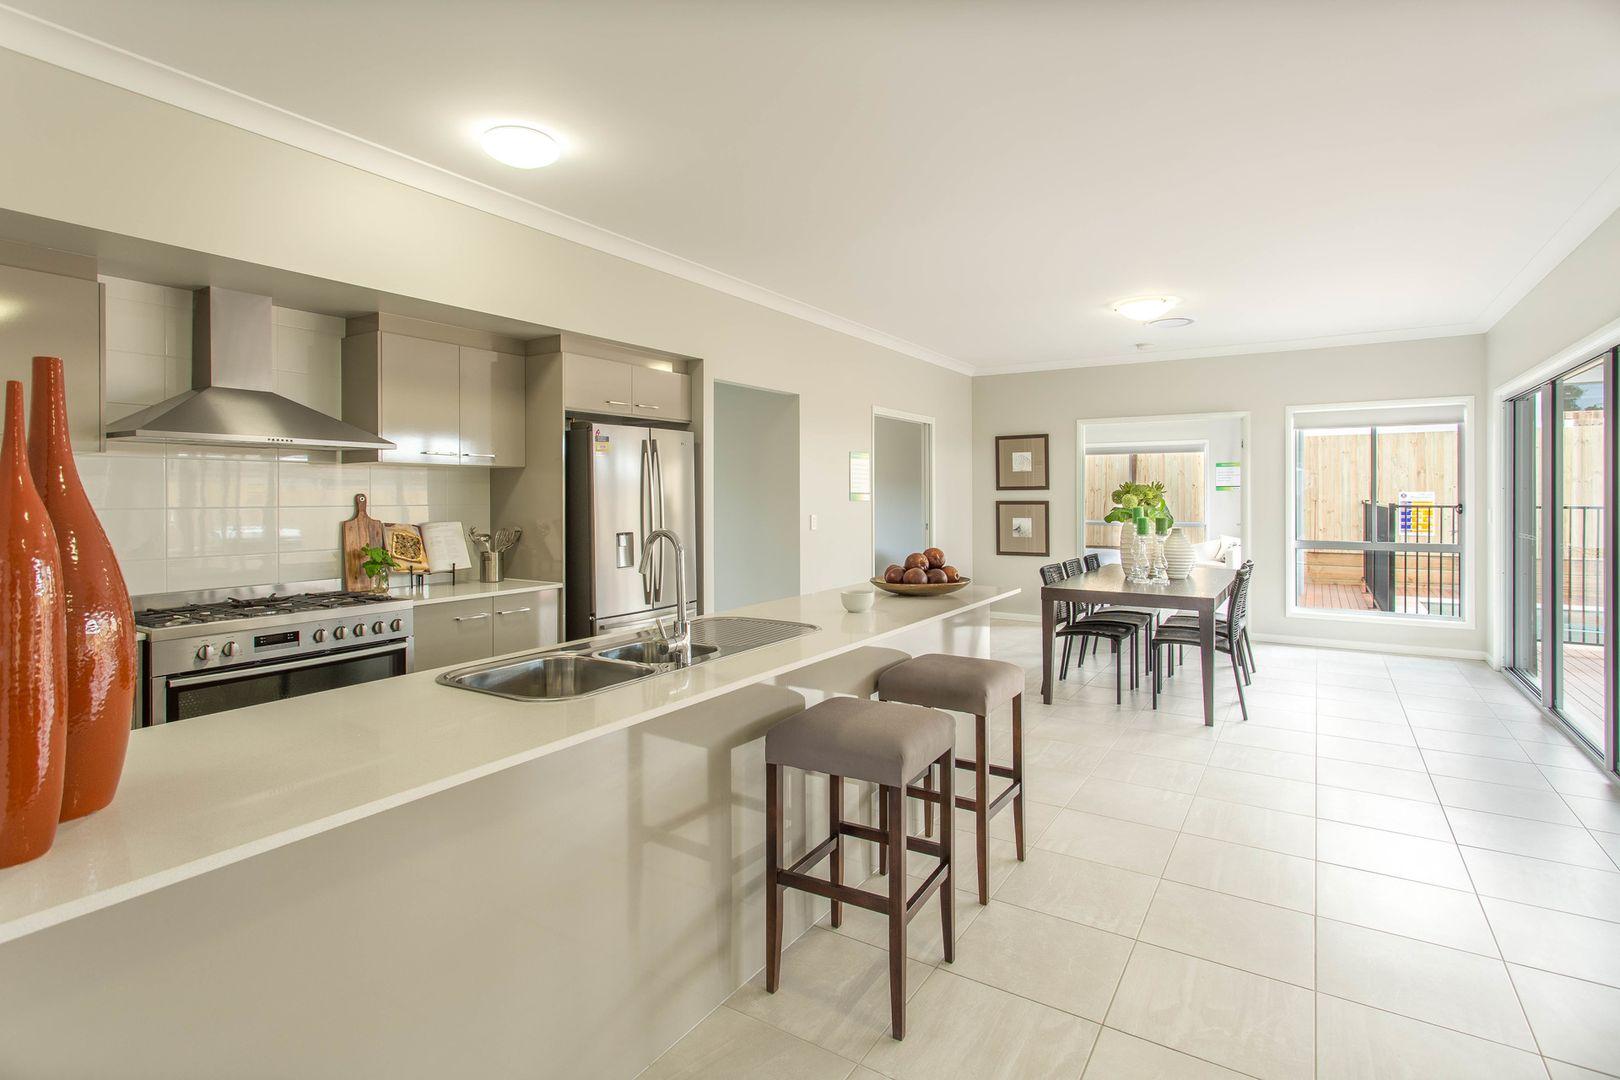 Lot 12, Woodside Park, Fernvale QLD 4306, Image 1